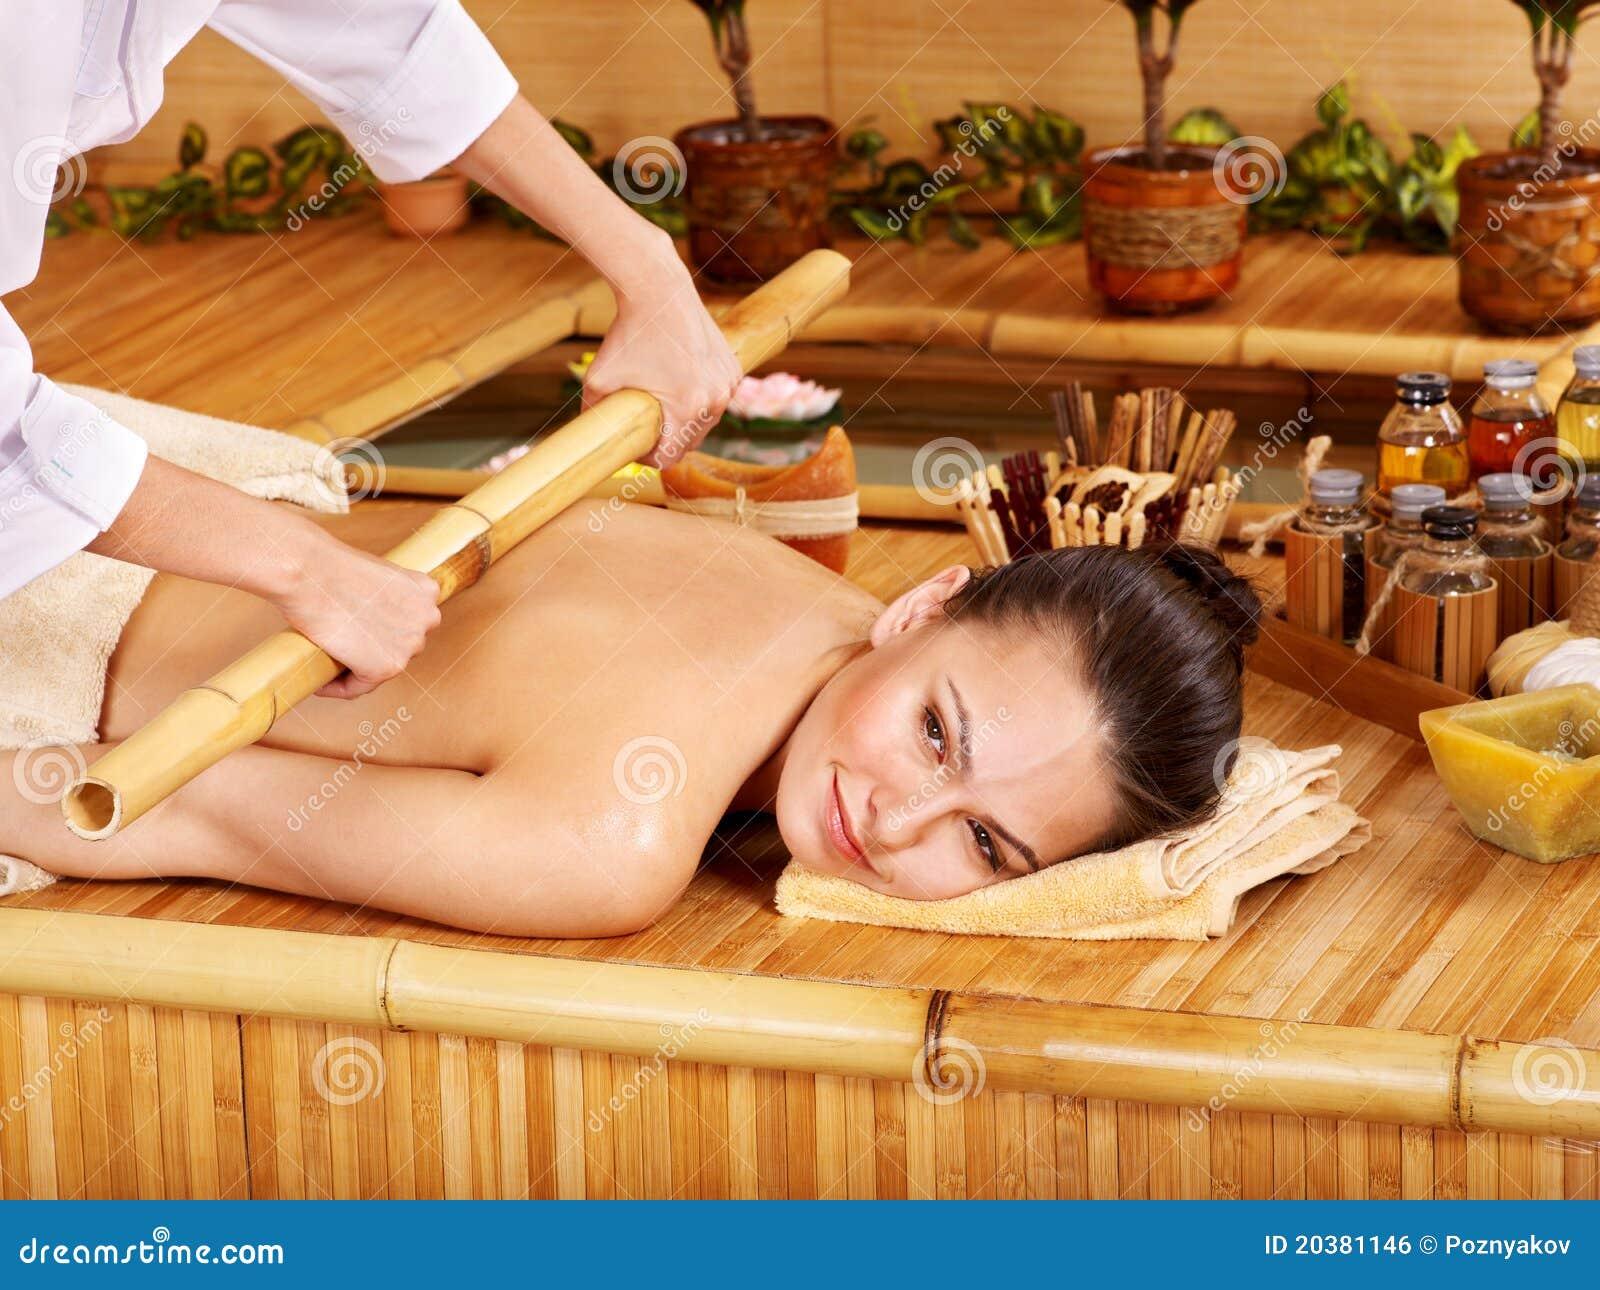 Фото массажа в бане 24 фотография